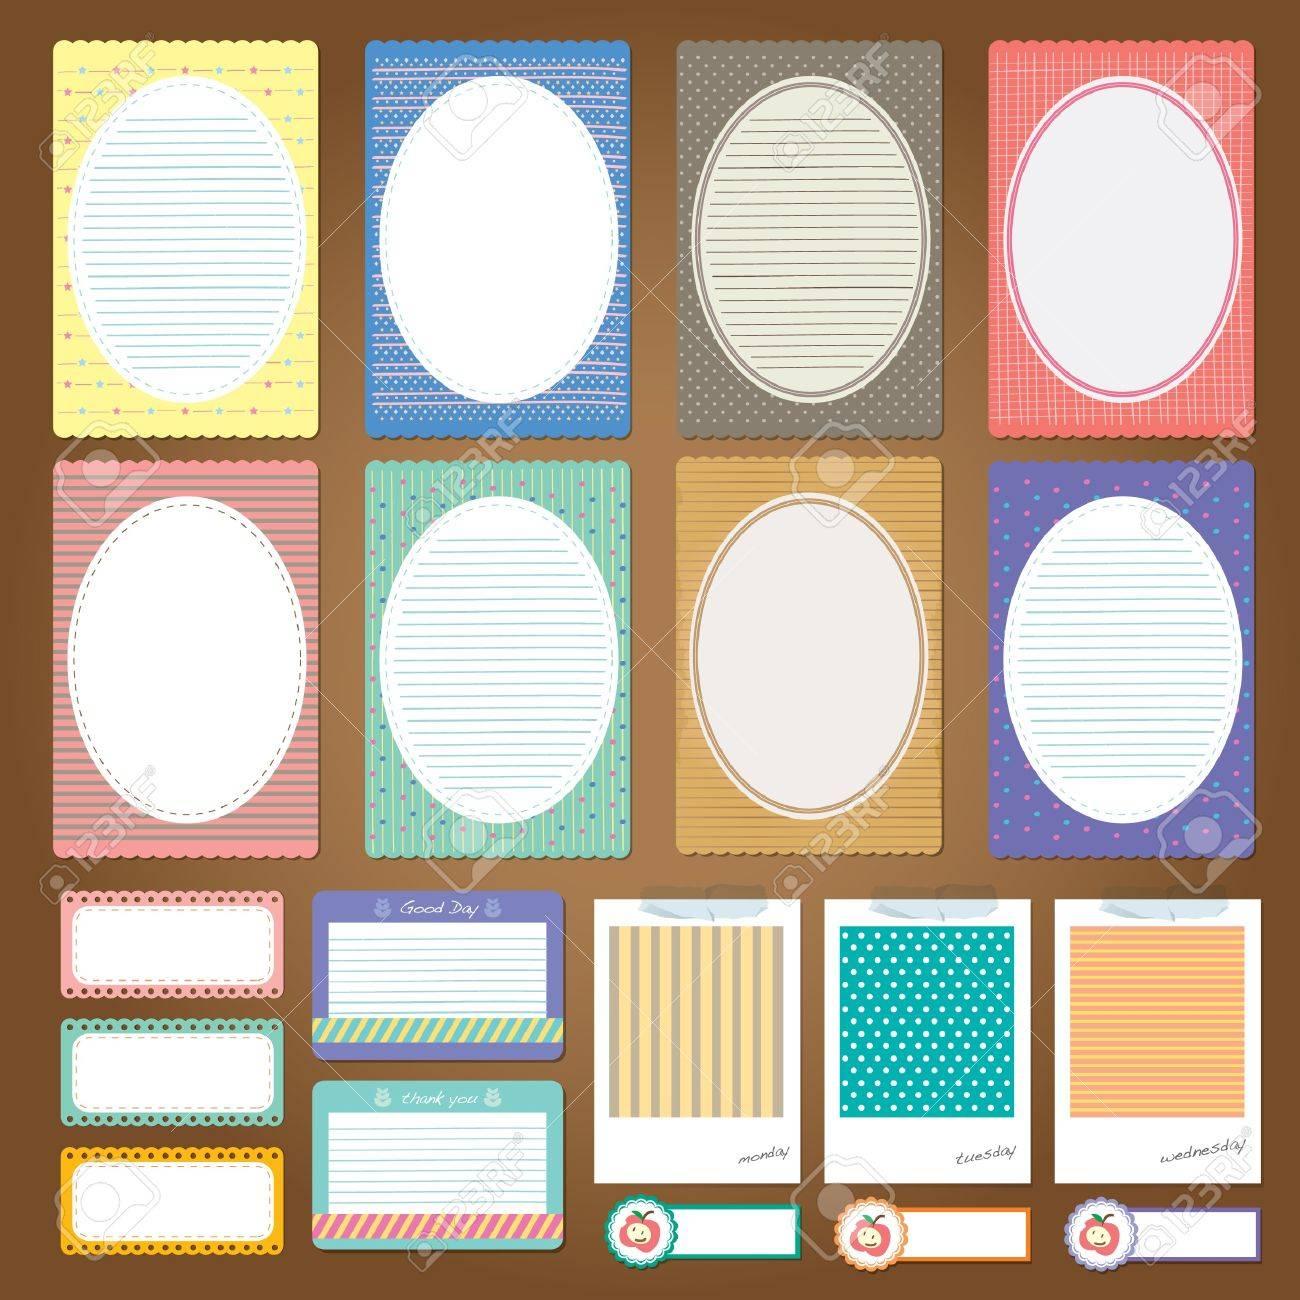 Scrapbook paper design - Vector Different Note Paper Design Set Scrapbook Elements